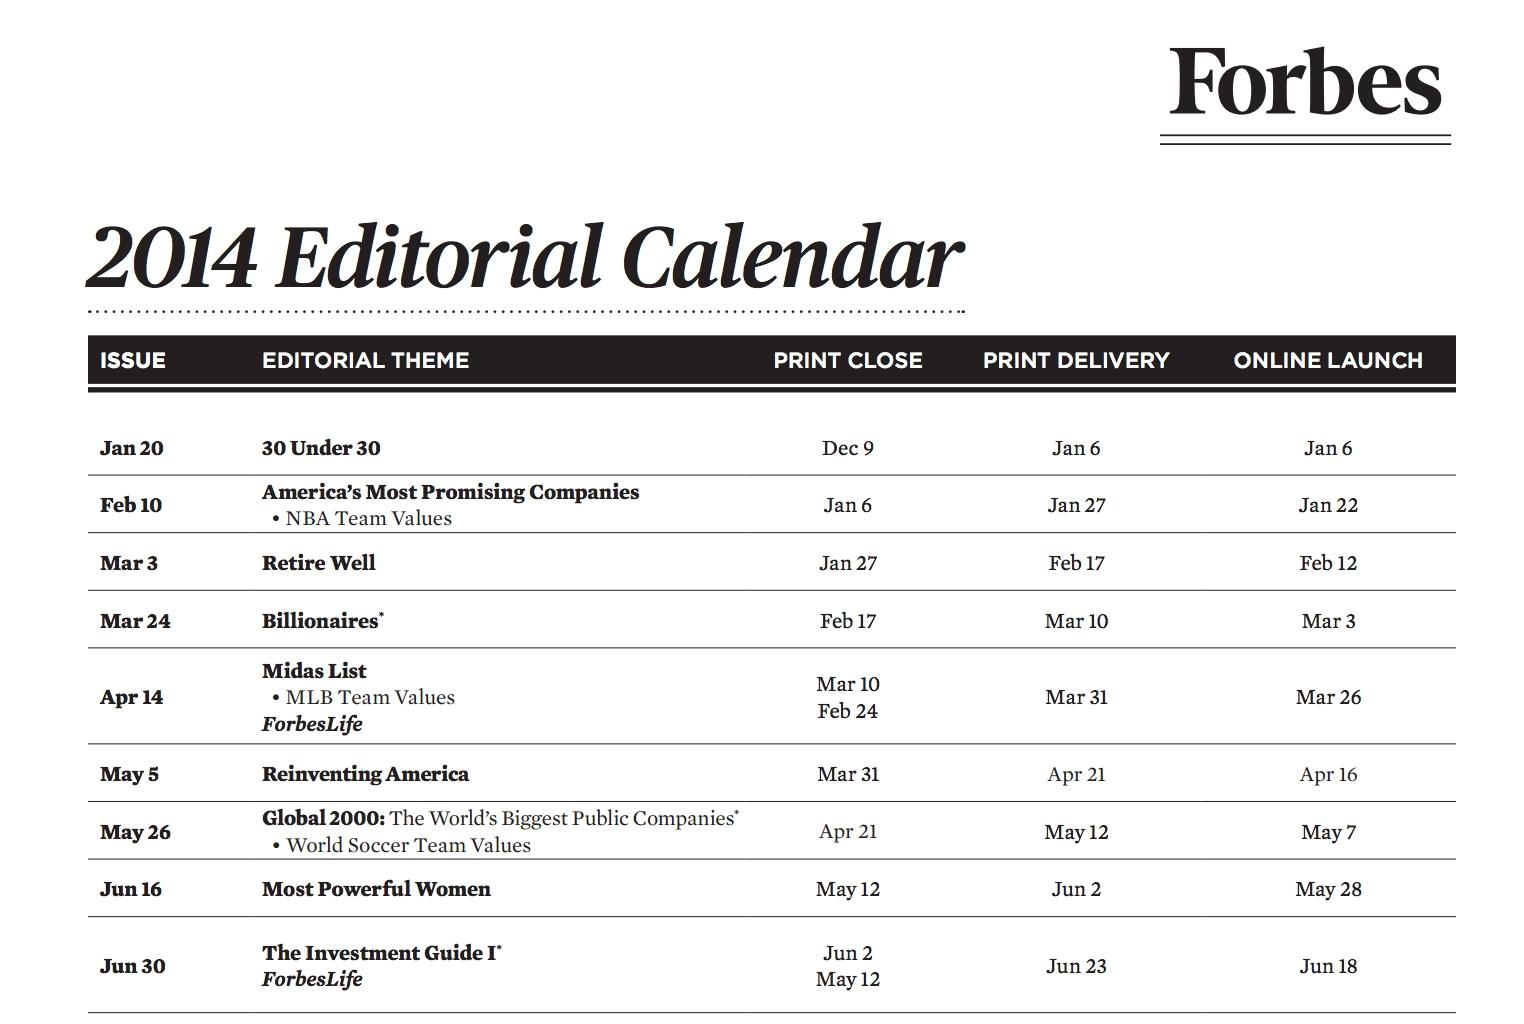 The Complete Guide To Choosing A Content Calendar throughout Social Media Calendar For Apparel Brands